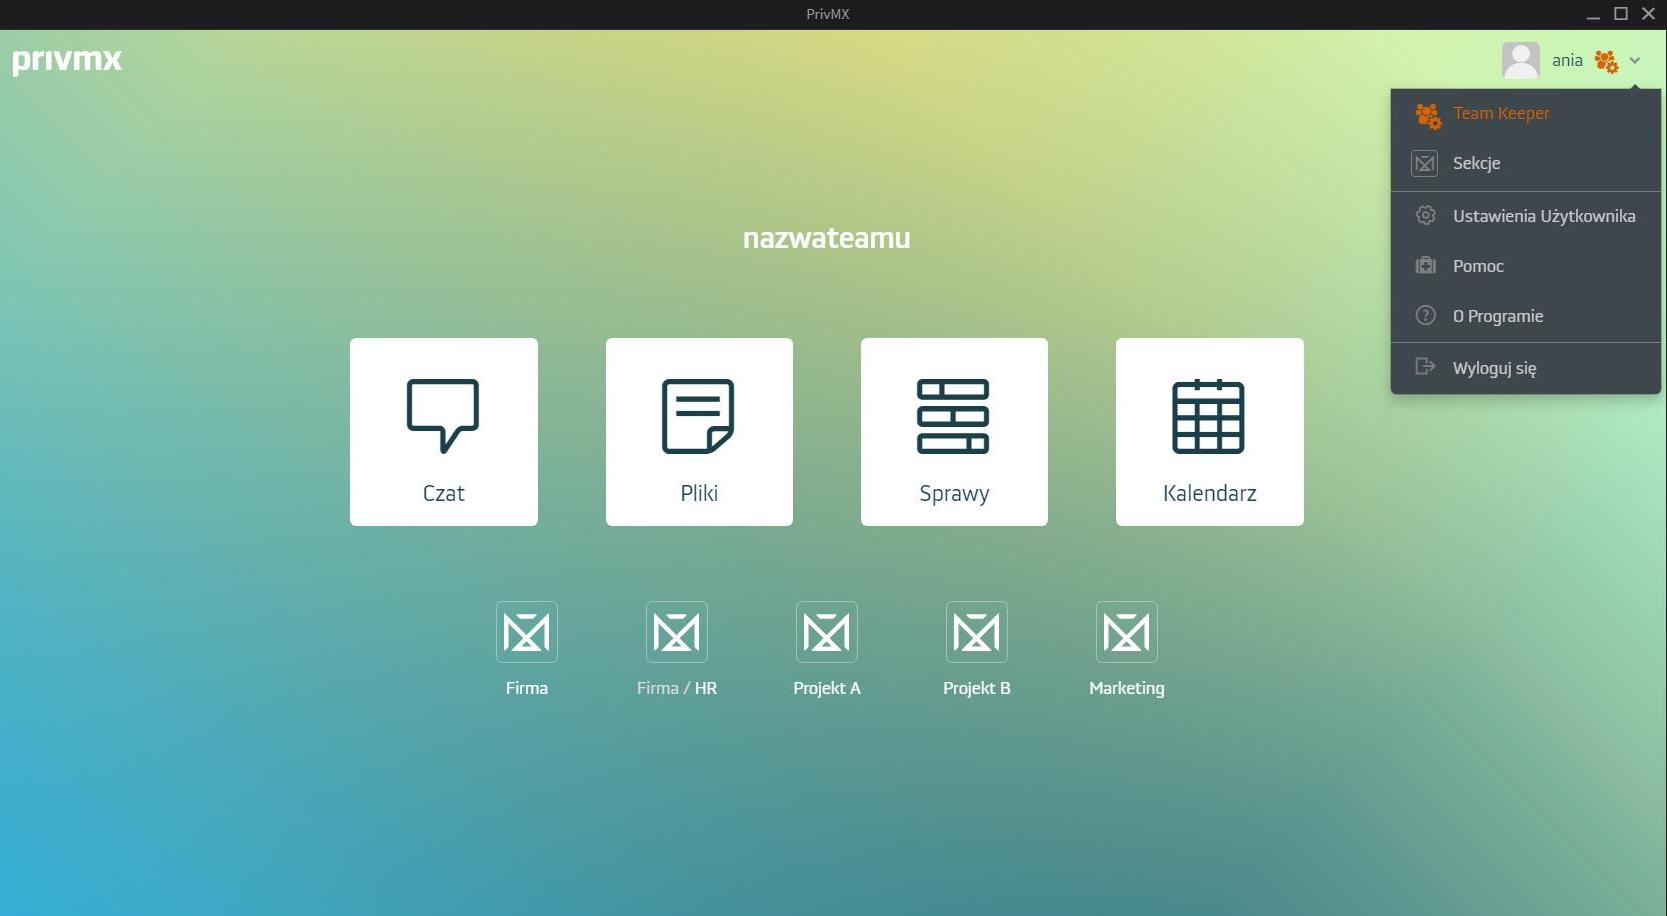 interfejs PrivMX strona startowa